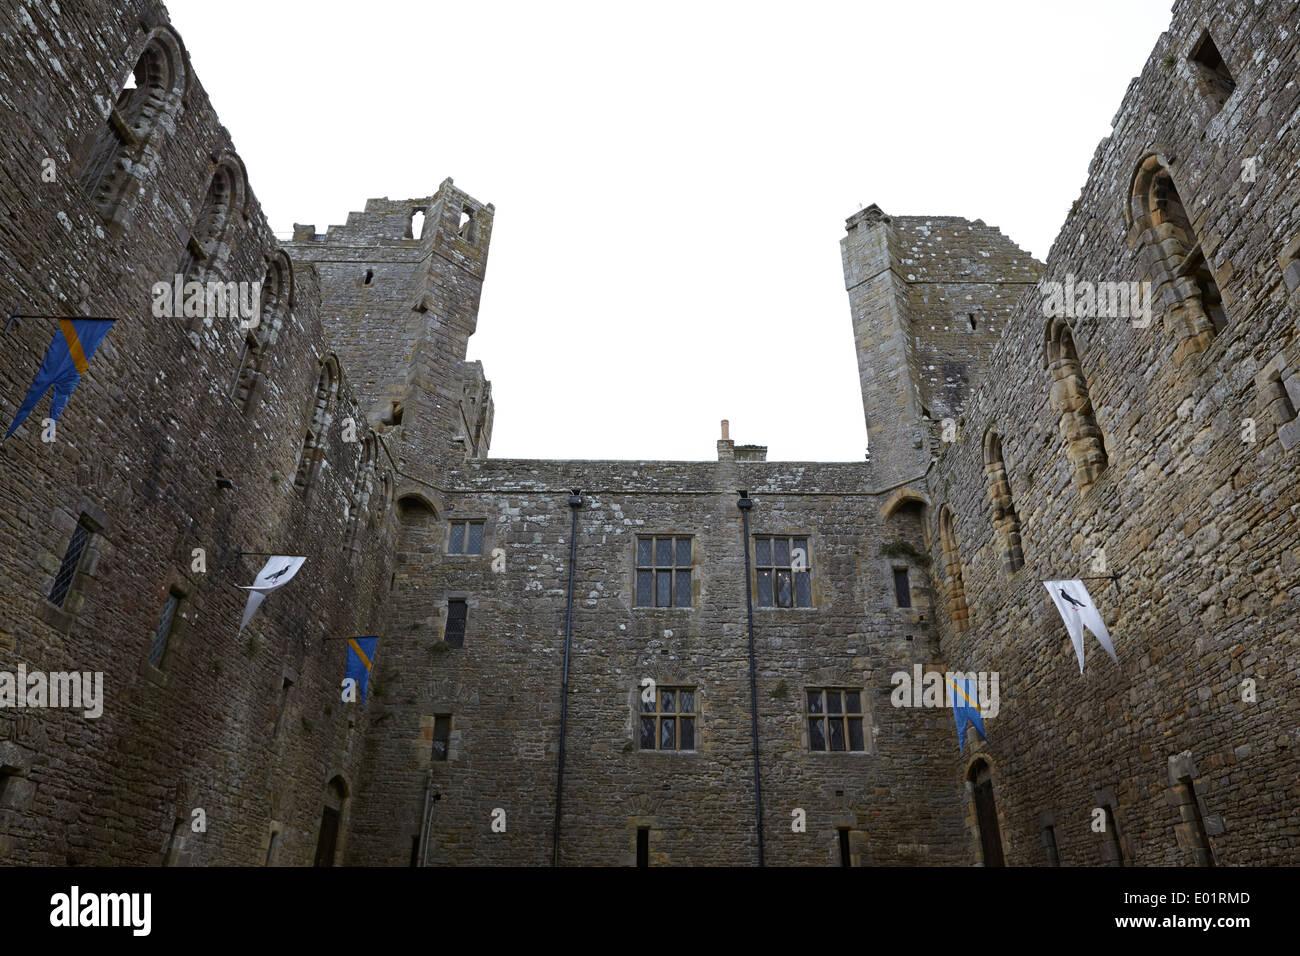 Ripley castle yorkshire Photo Stock